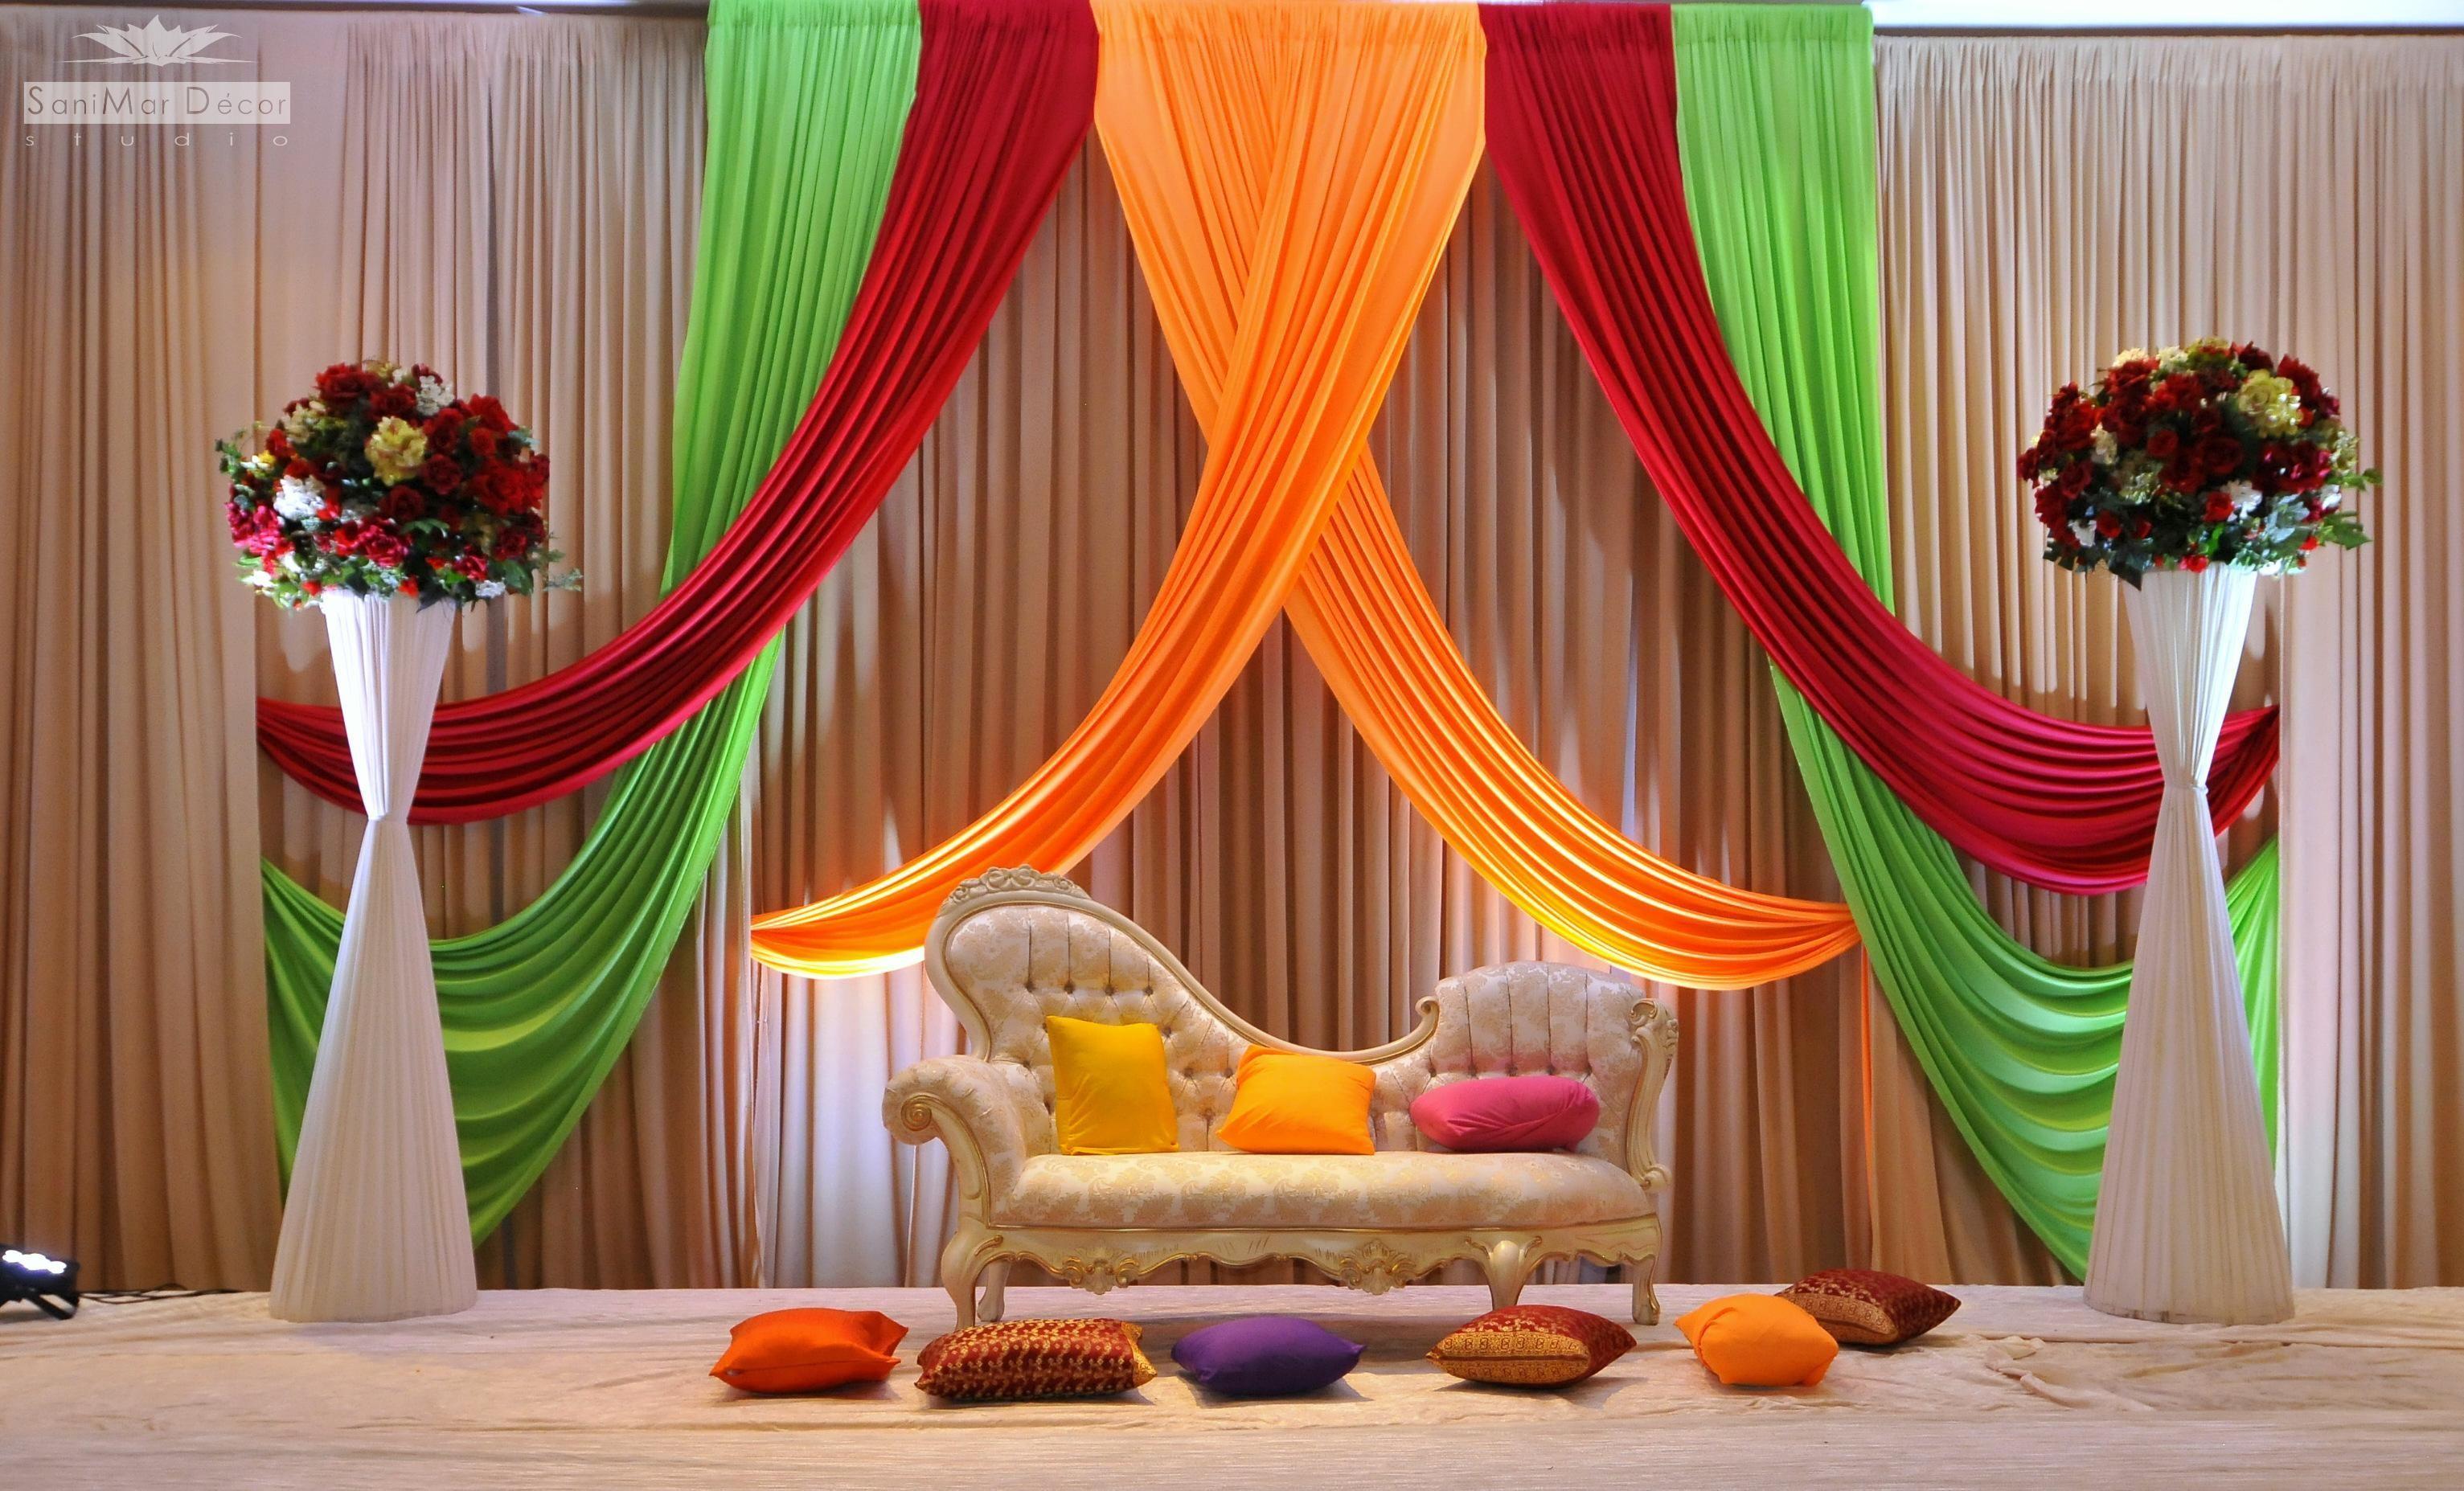 Wedding Stage Decoration At Home https://ift.tt/3cc1jpR in ...